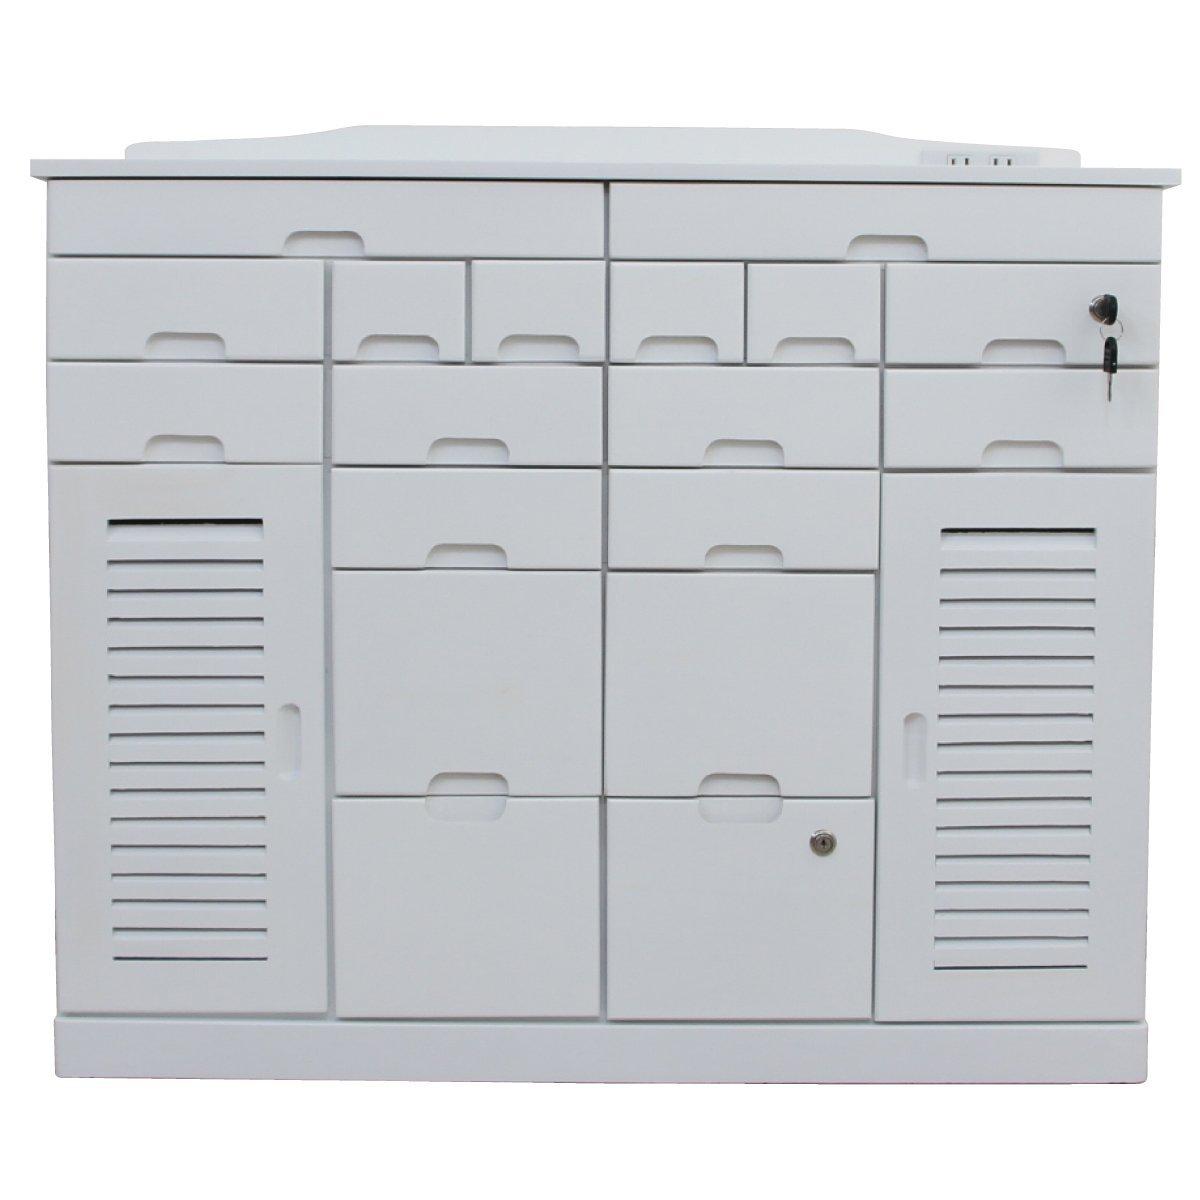 8x Kitchen Bedroom Cupboard Drawer Runner Screws Zinc-Plated M4 10.5mm IKEA Draw